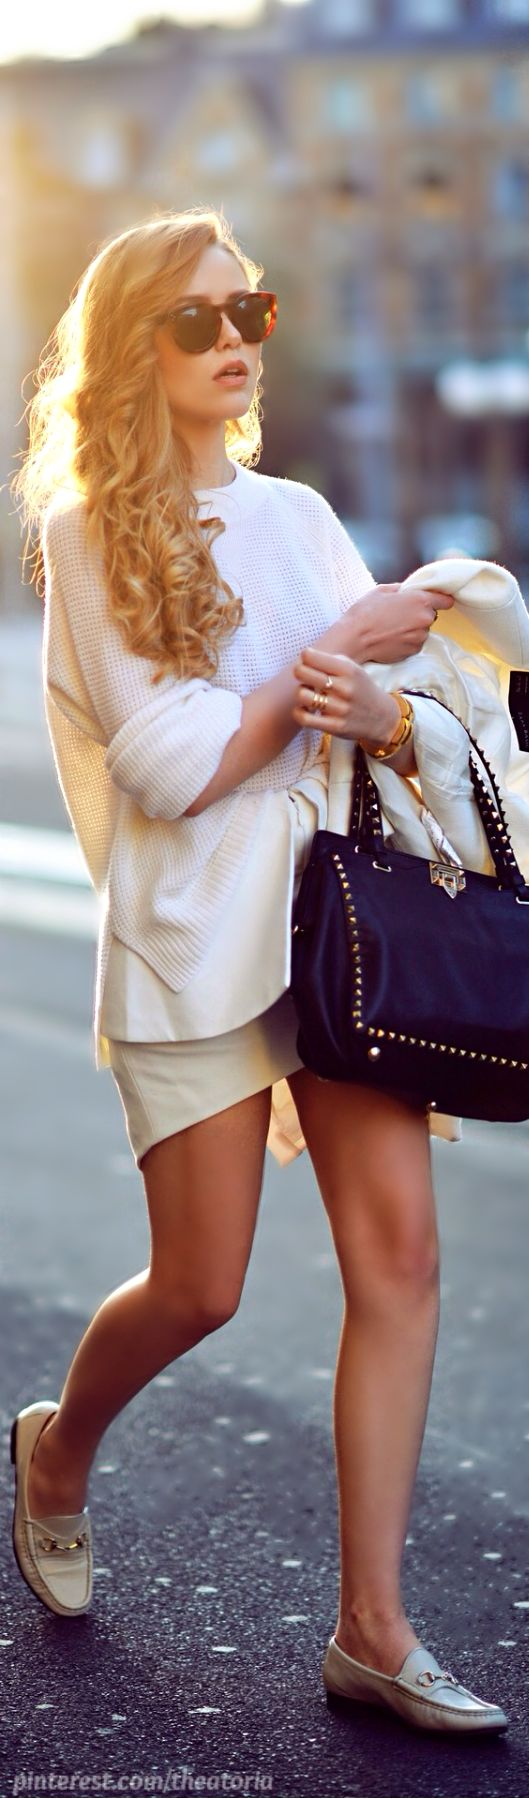 Chic In The City- LadyLuxury